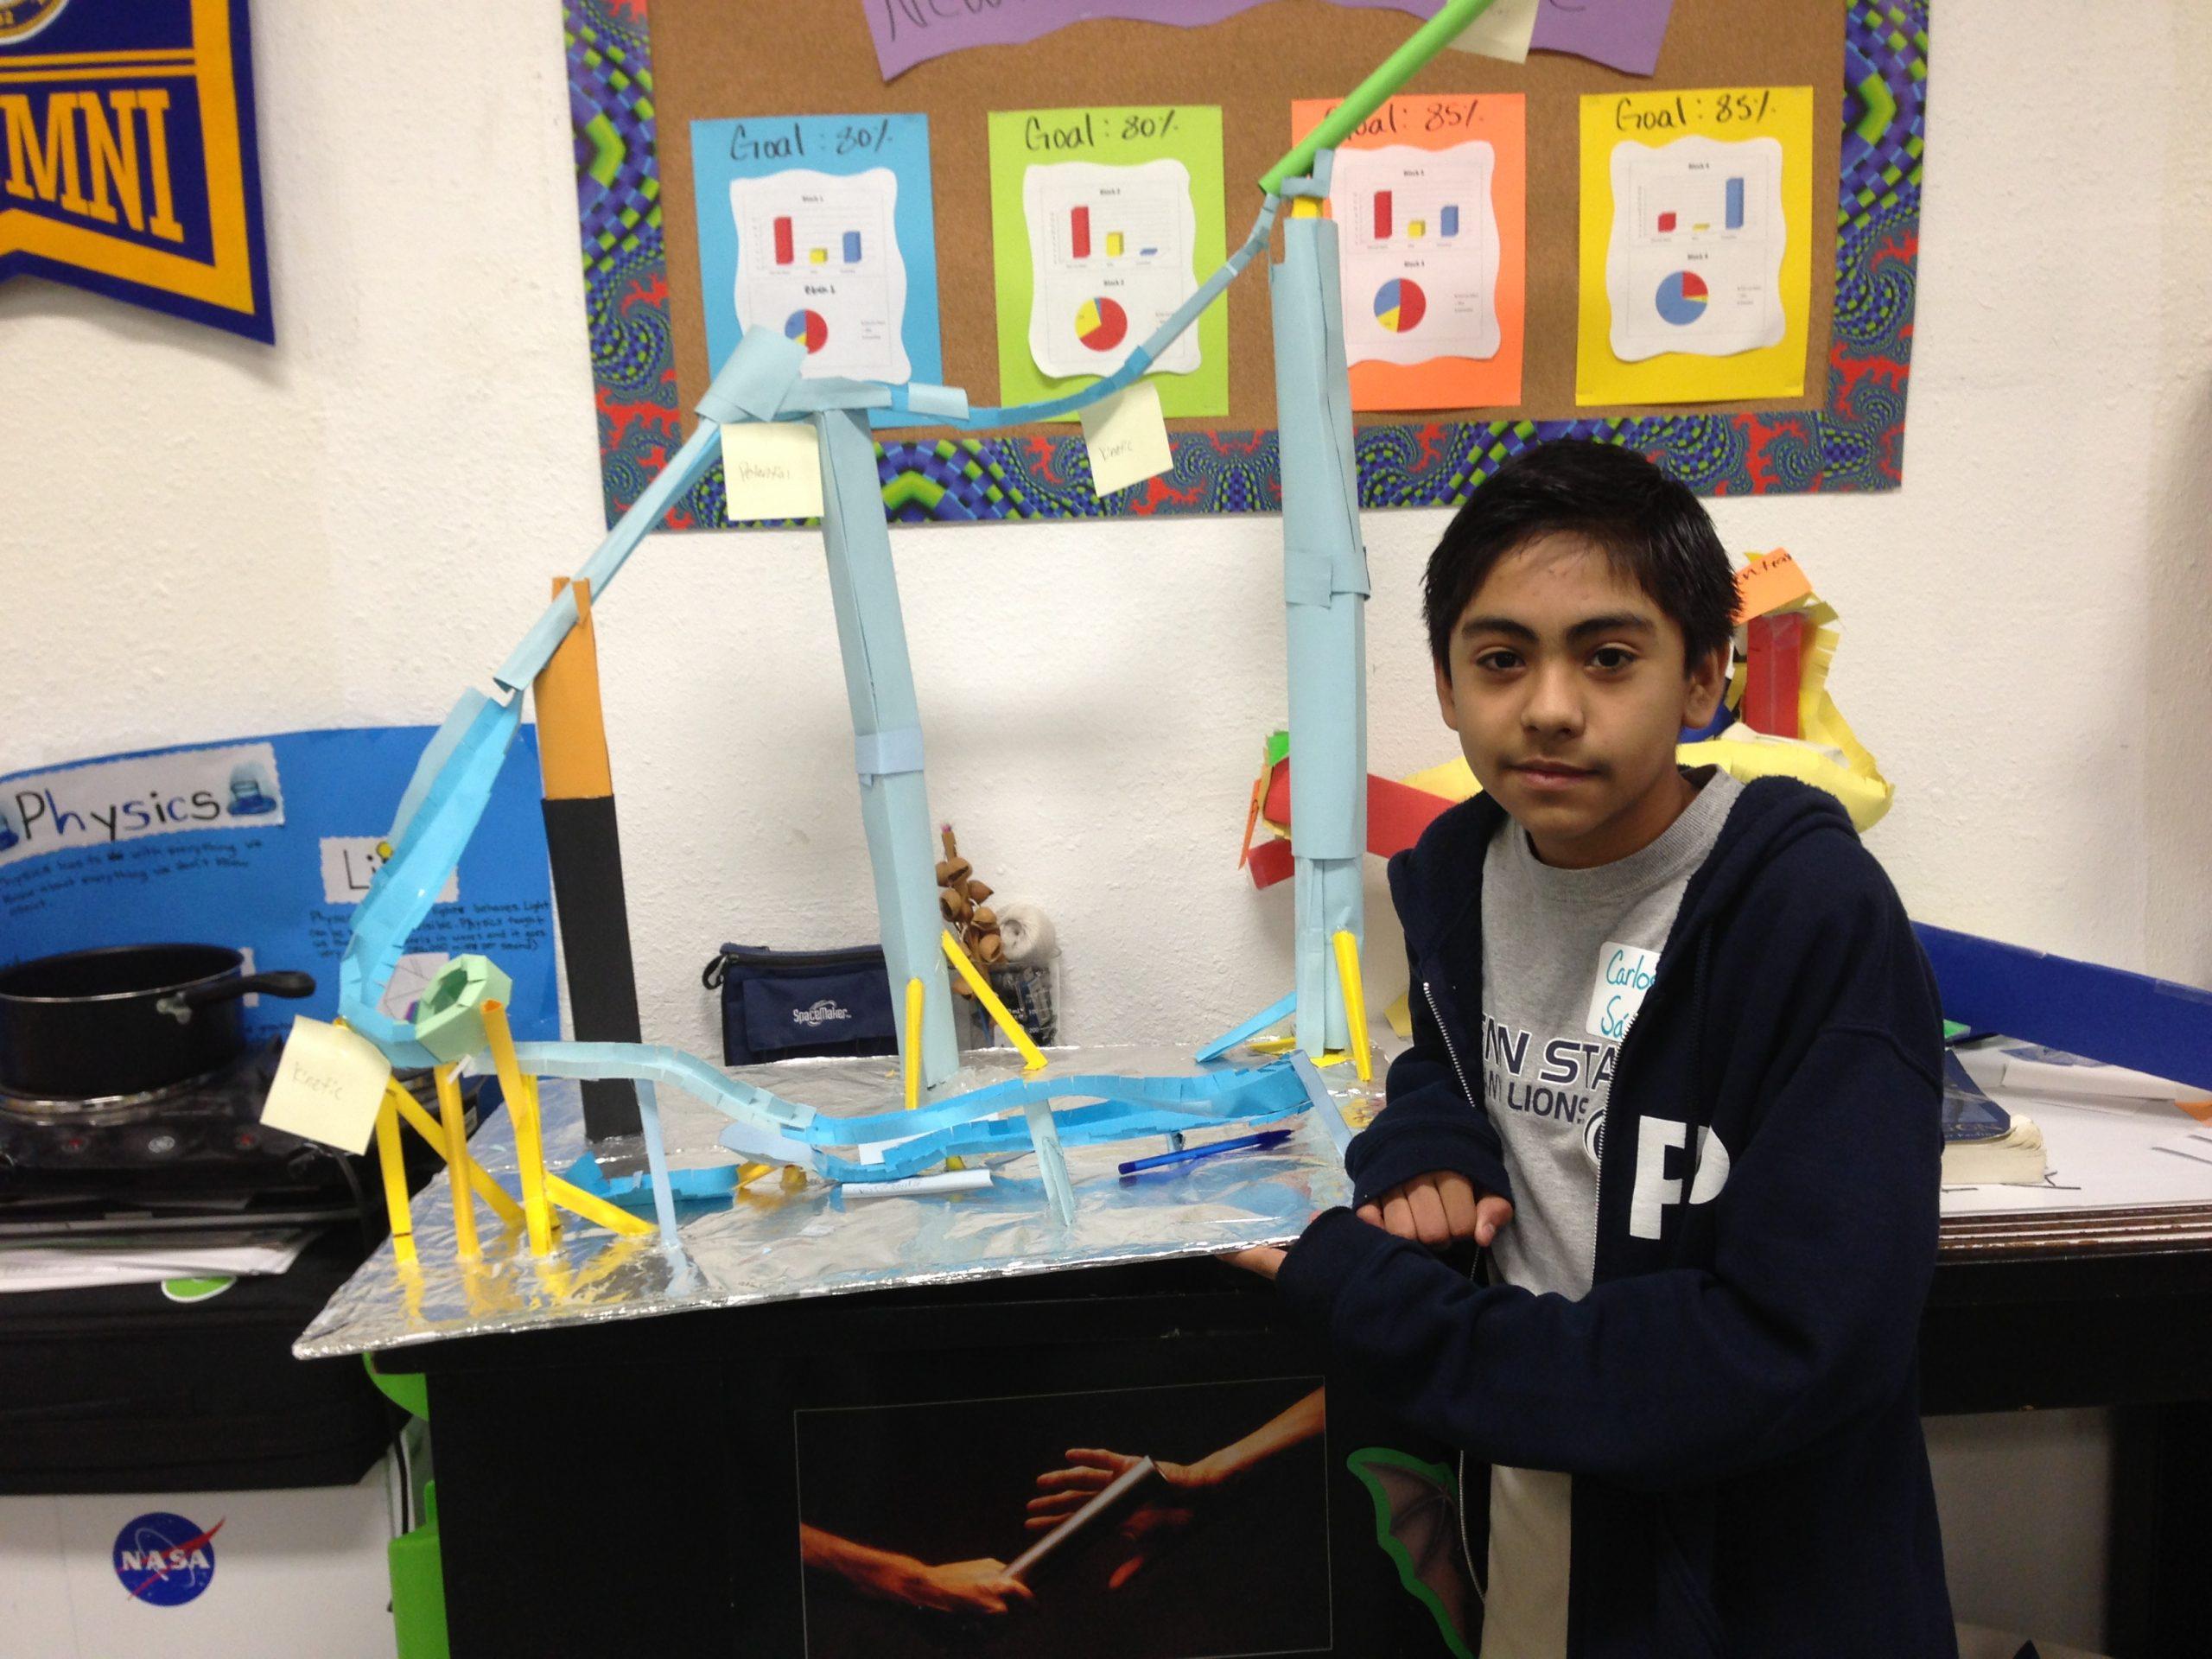 Carlos Sanchez shows off his physics roller coaster at KIPP Aspire. Photo by Bekah McNeel.